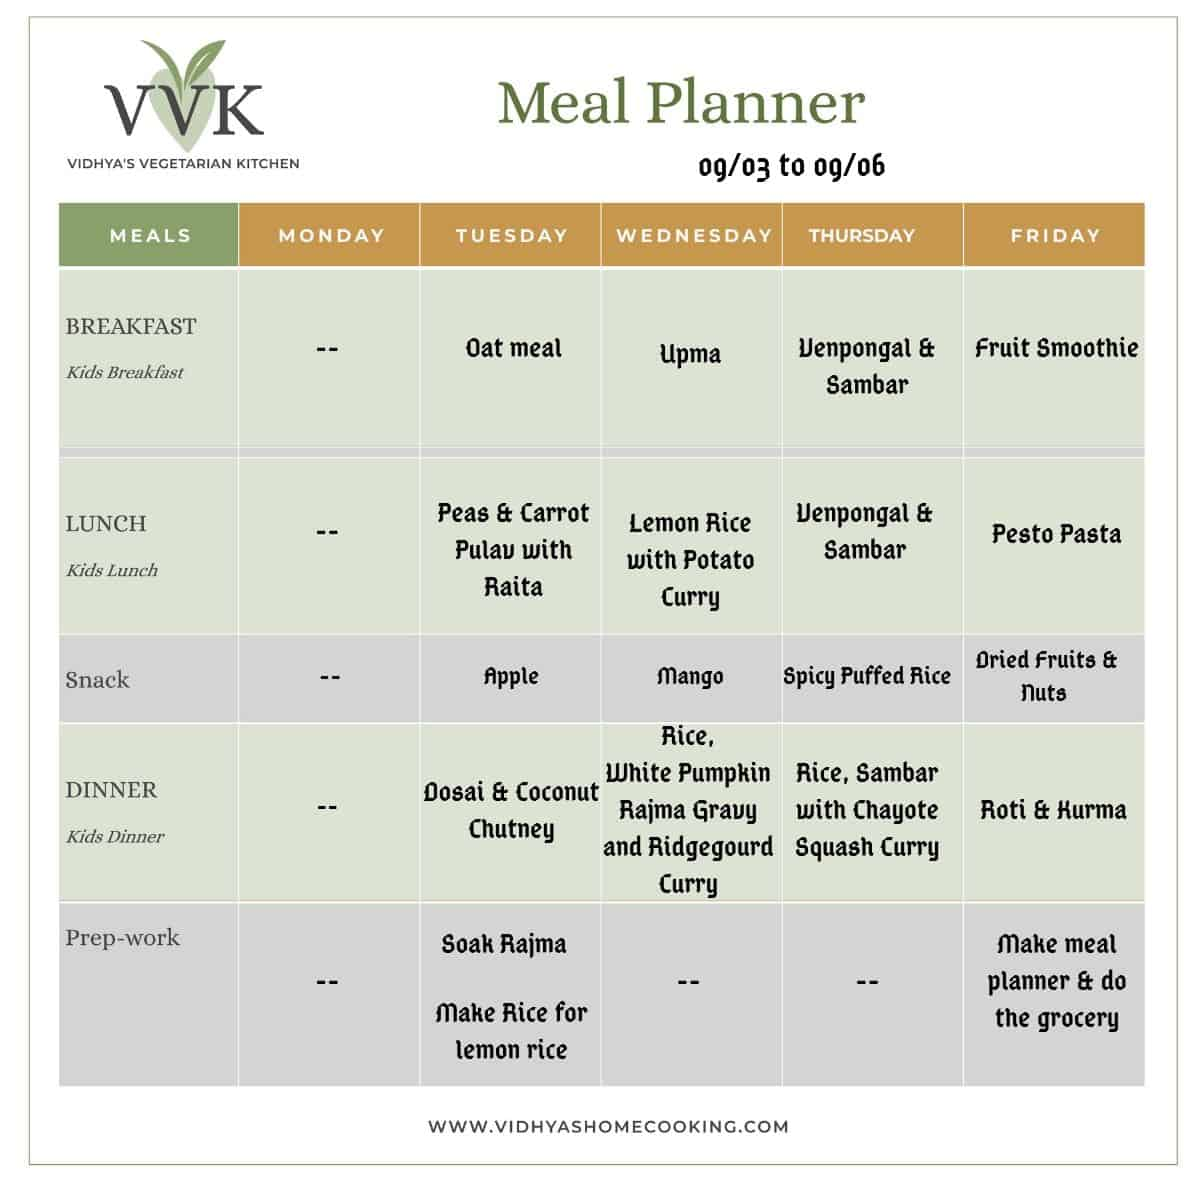 weekly meal planner - 0309